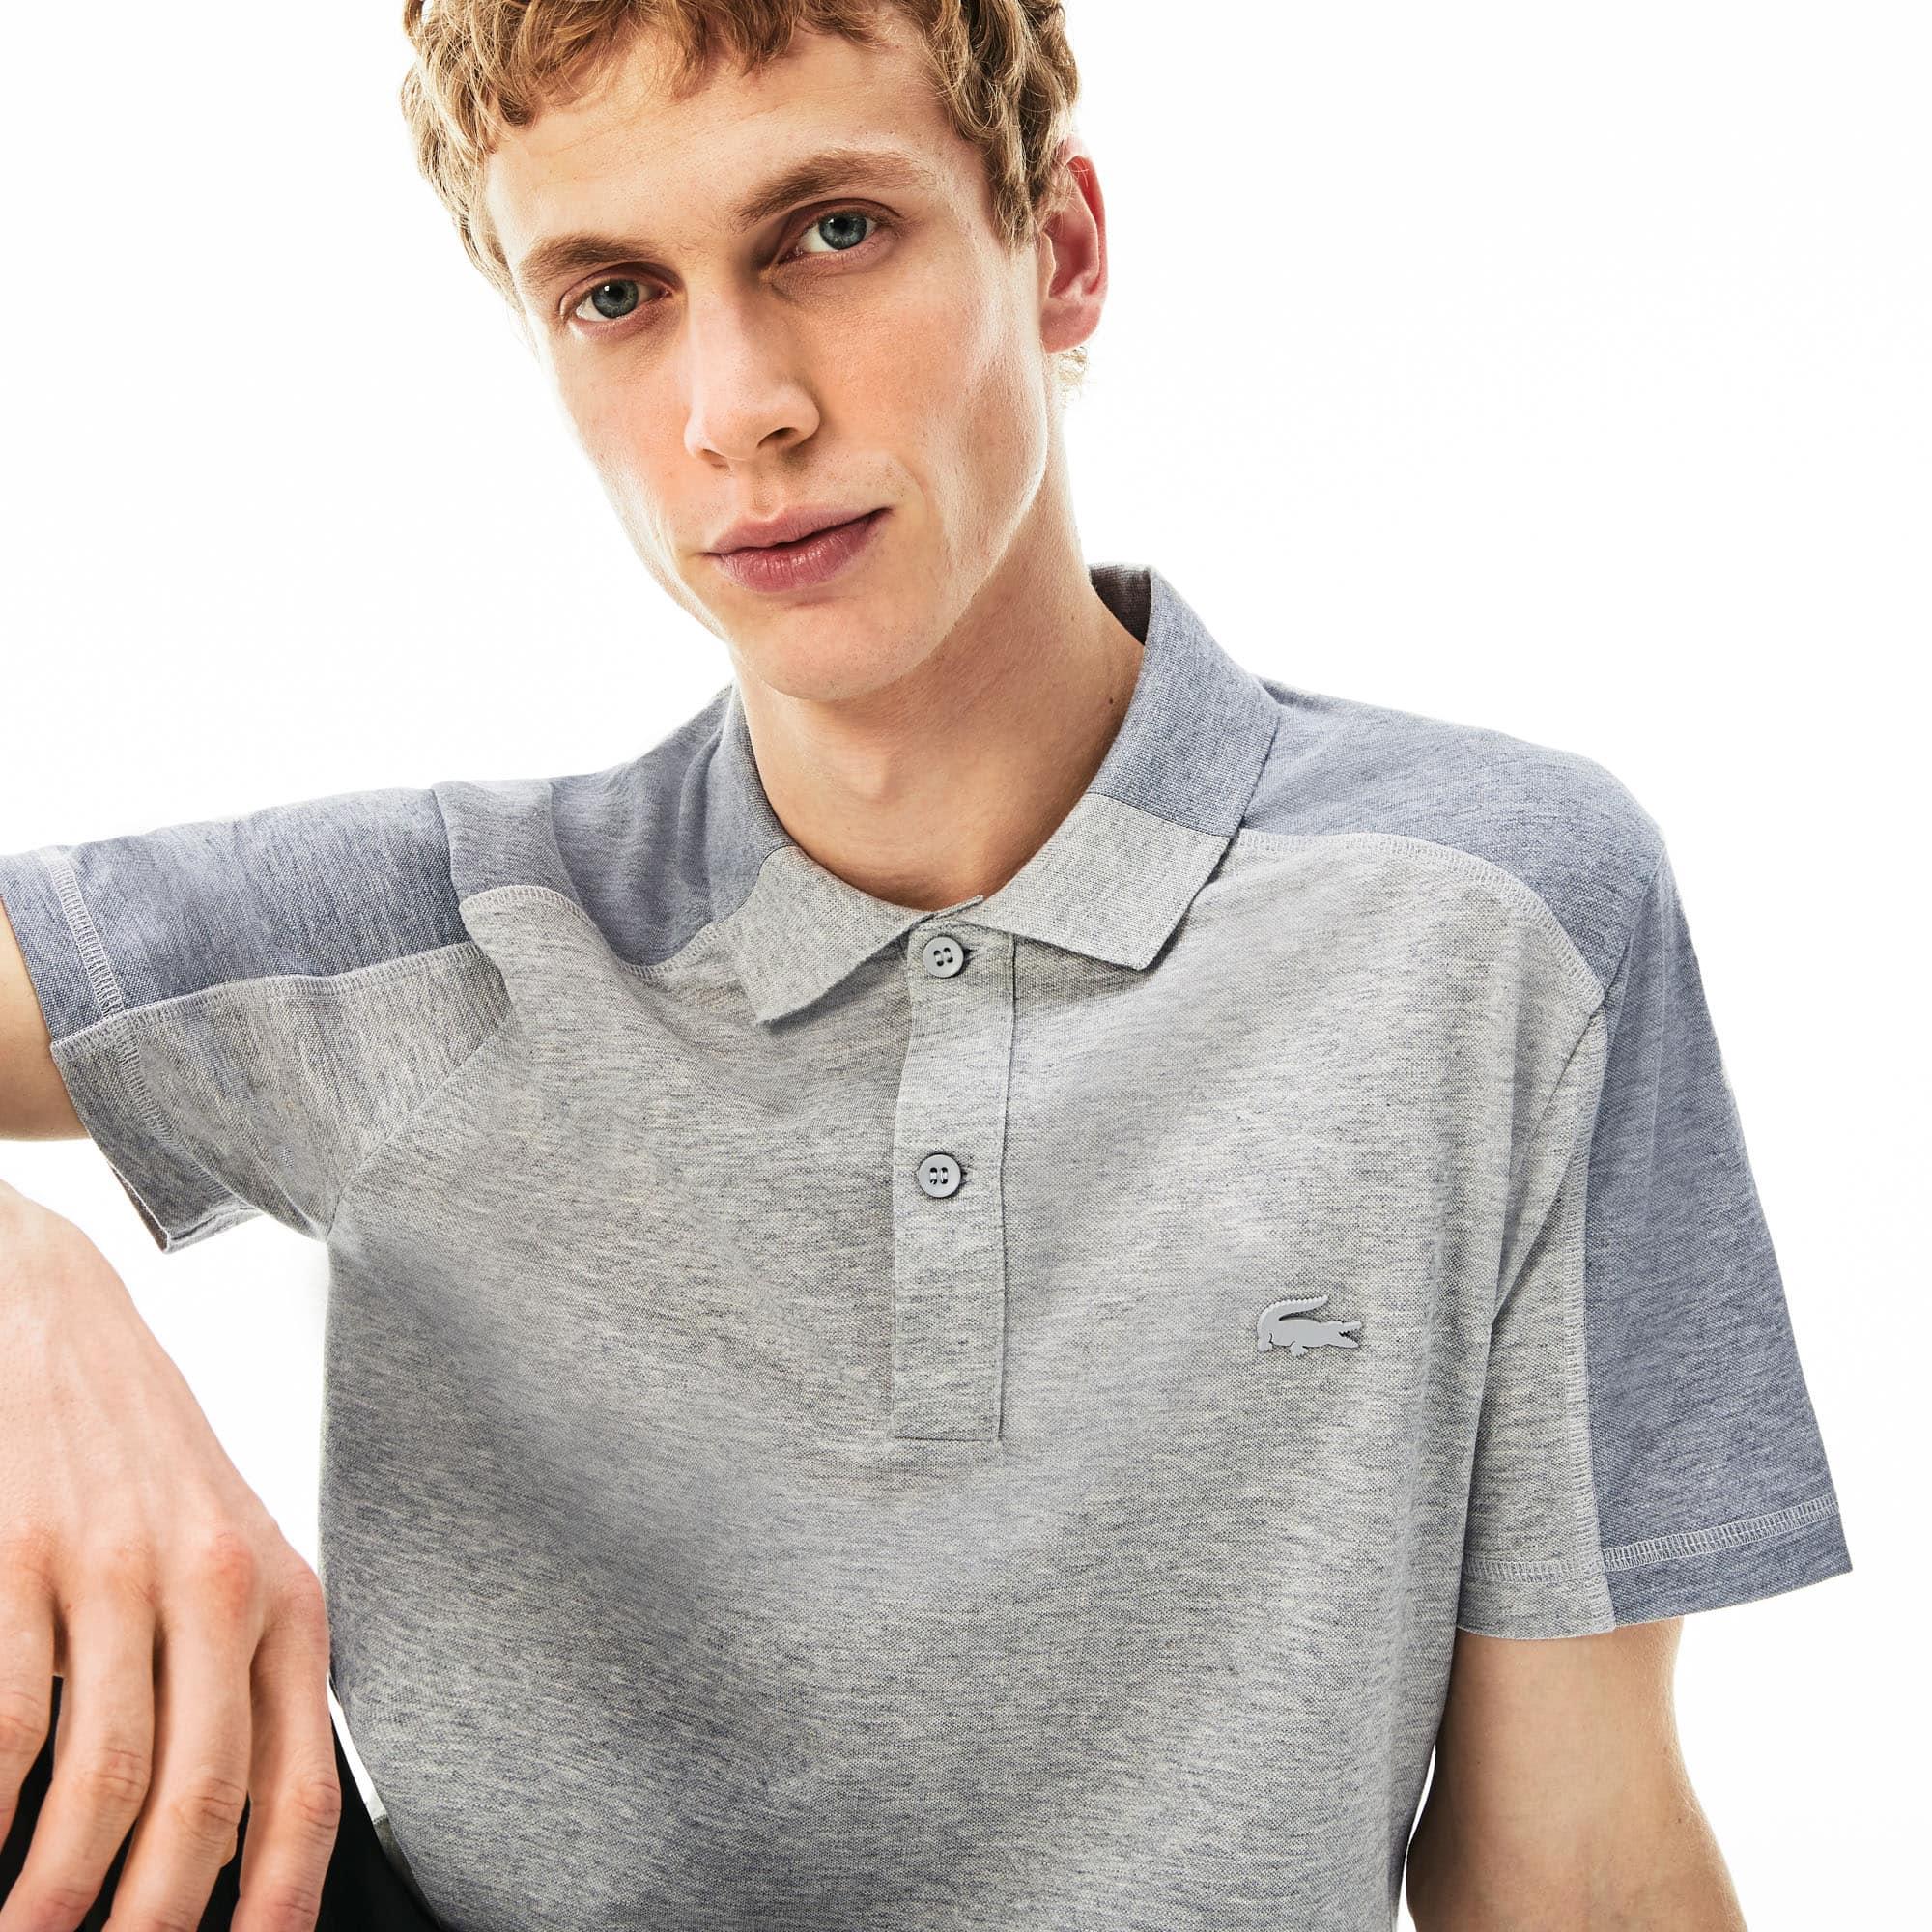 7d929a77 Men's Polo Shirts | Lacoste Polo Shirts for Men | LACOSTE